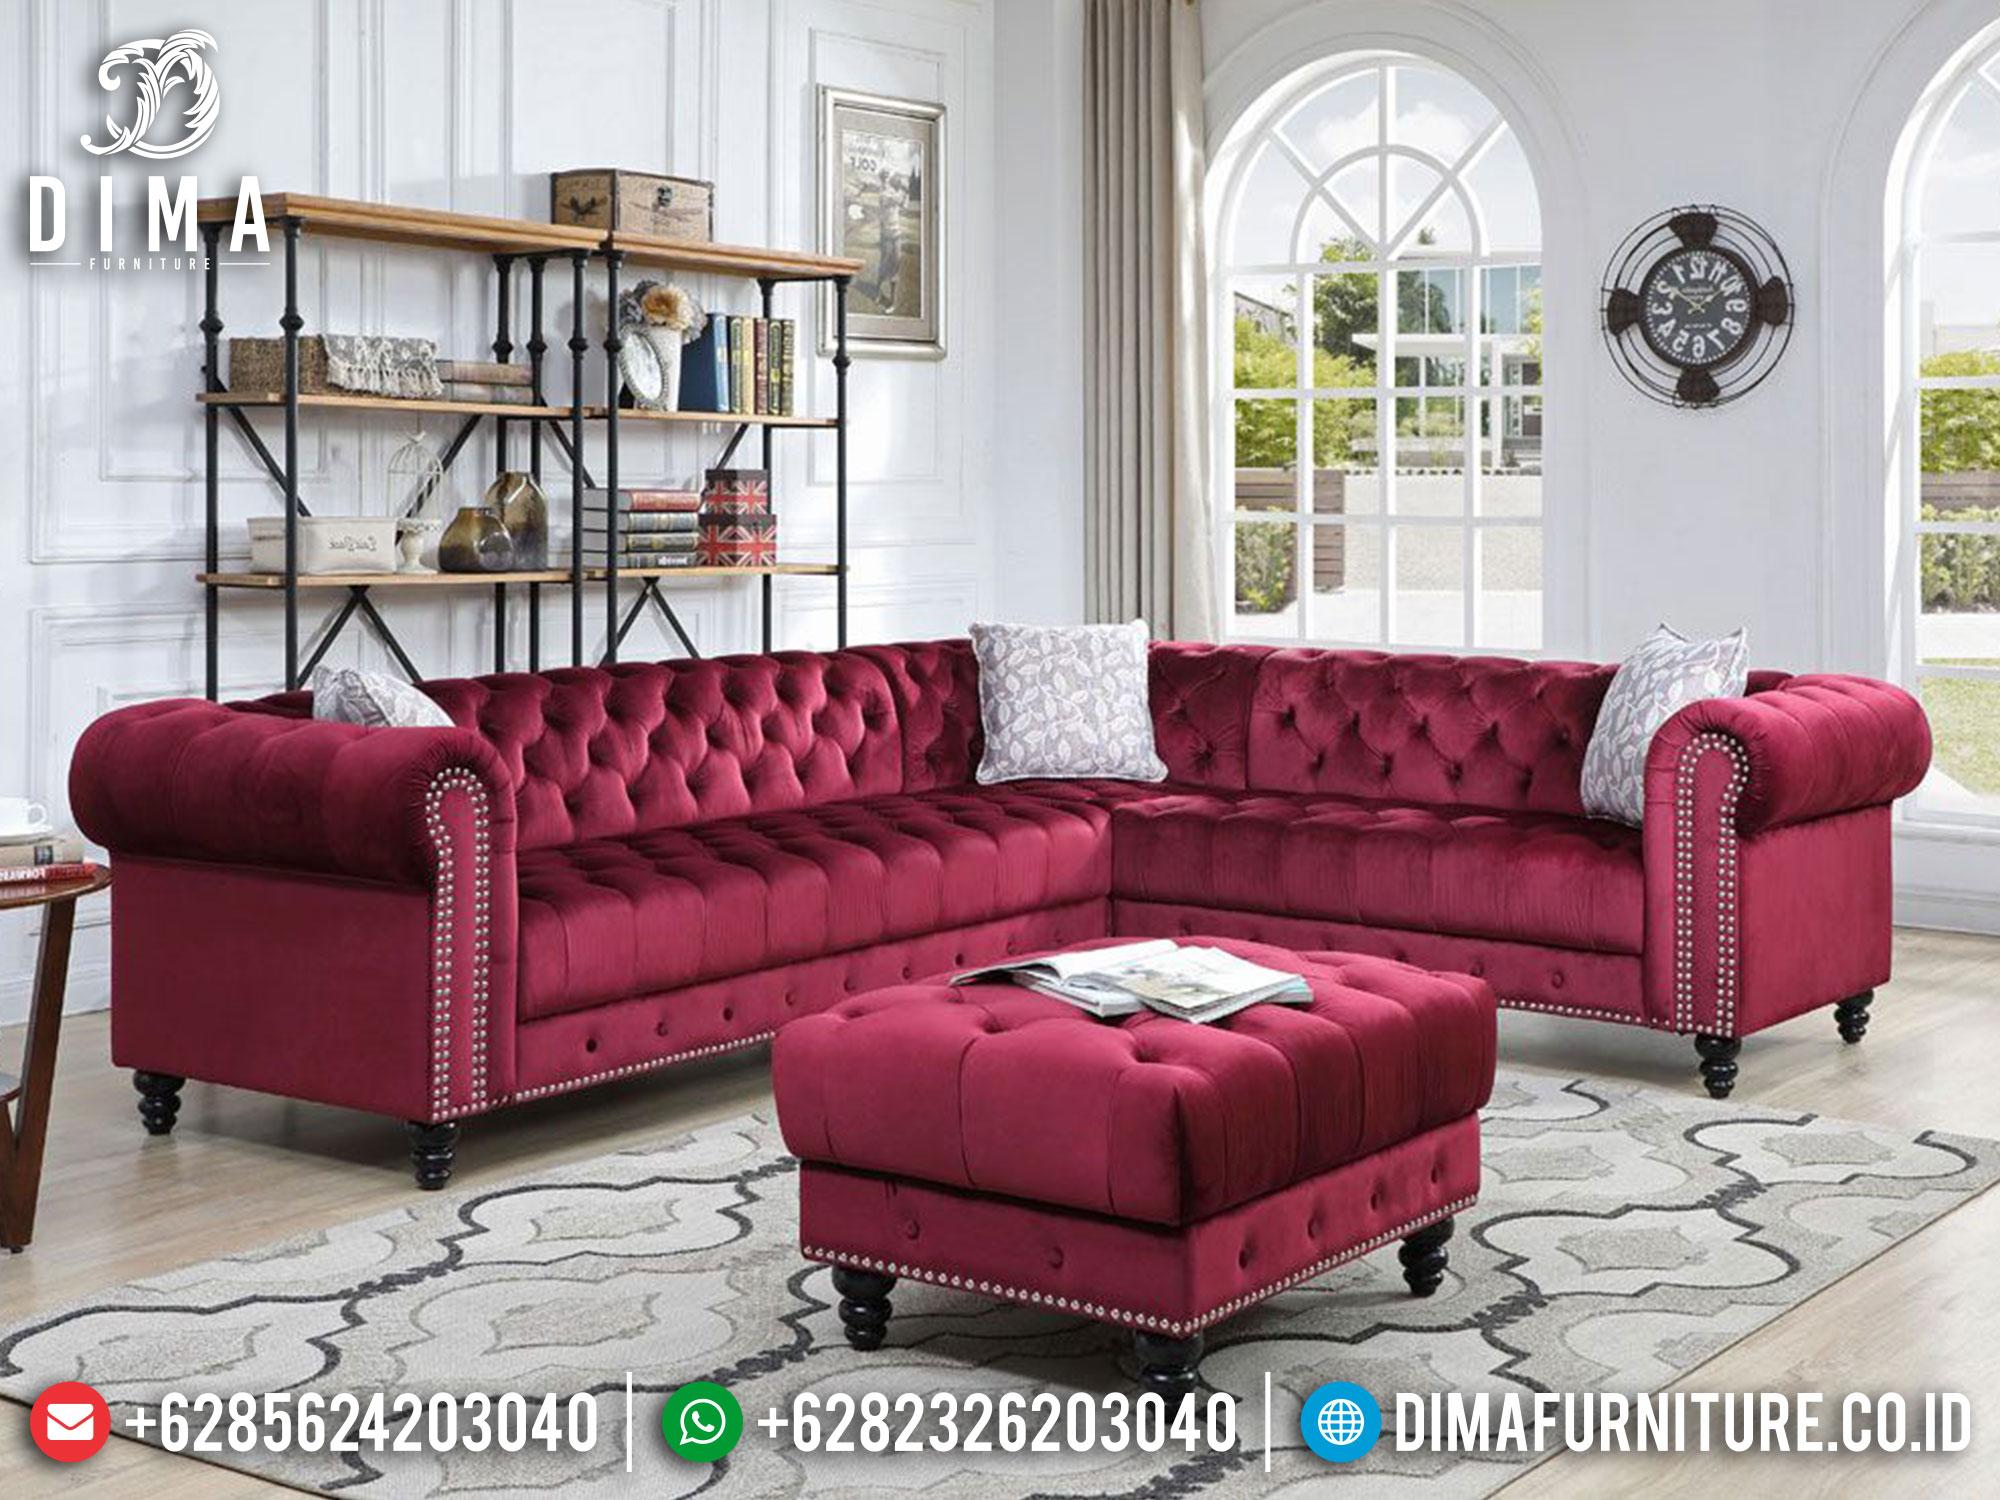 Sofa Sudut L Minimalis Mewah Jepara Maroon Red Df-1422